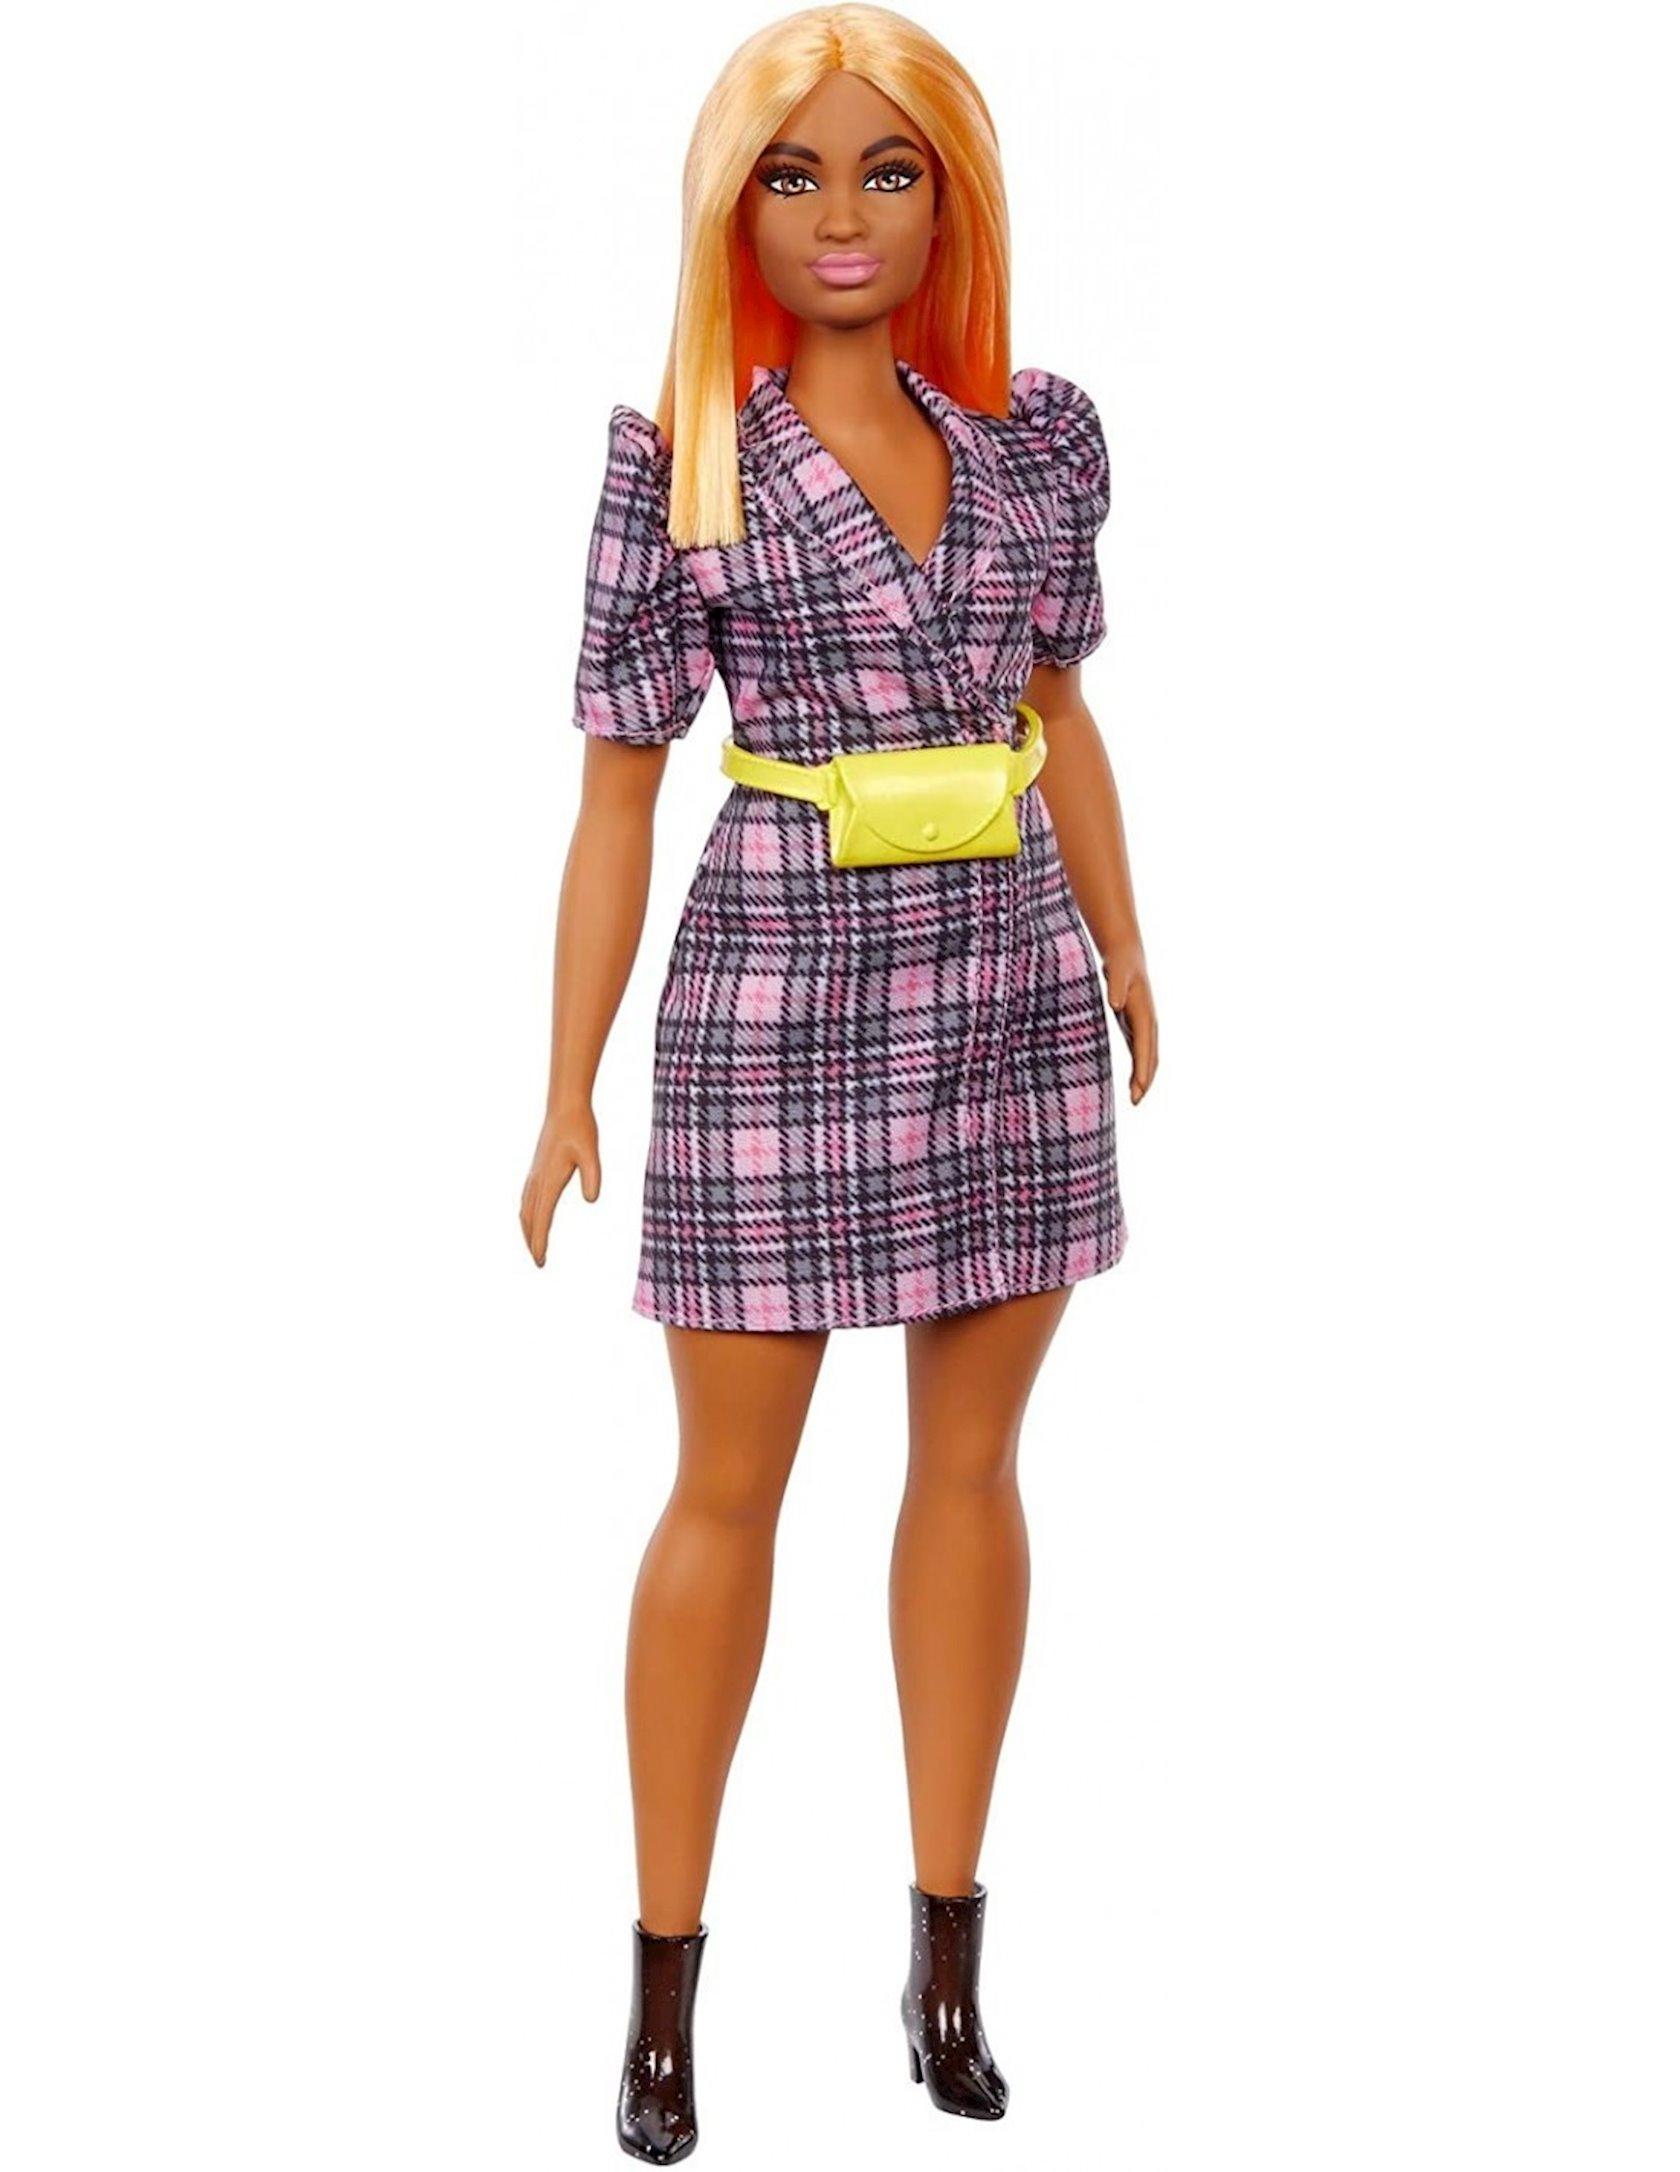 Kukla Barbie Mattel Fashionistas dama-dama pencək